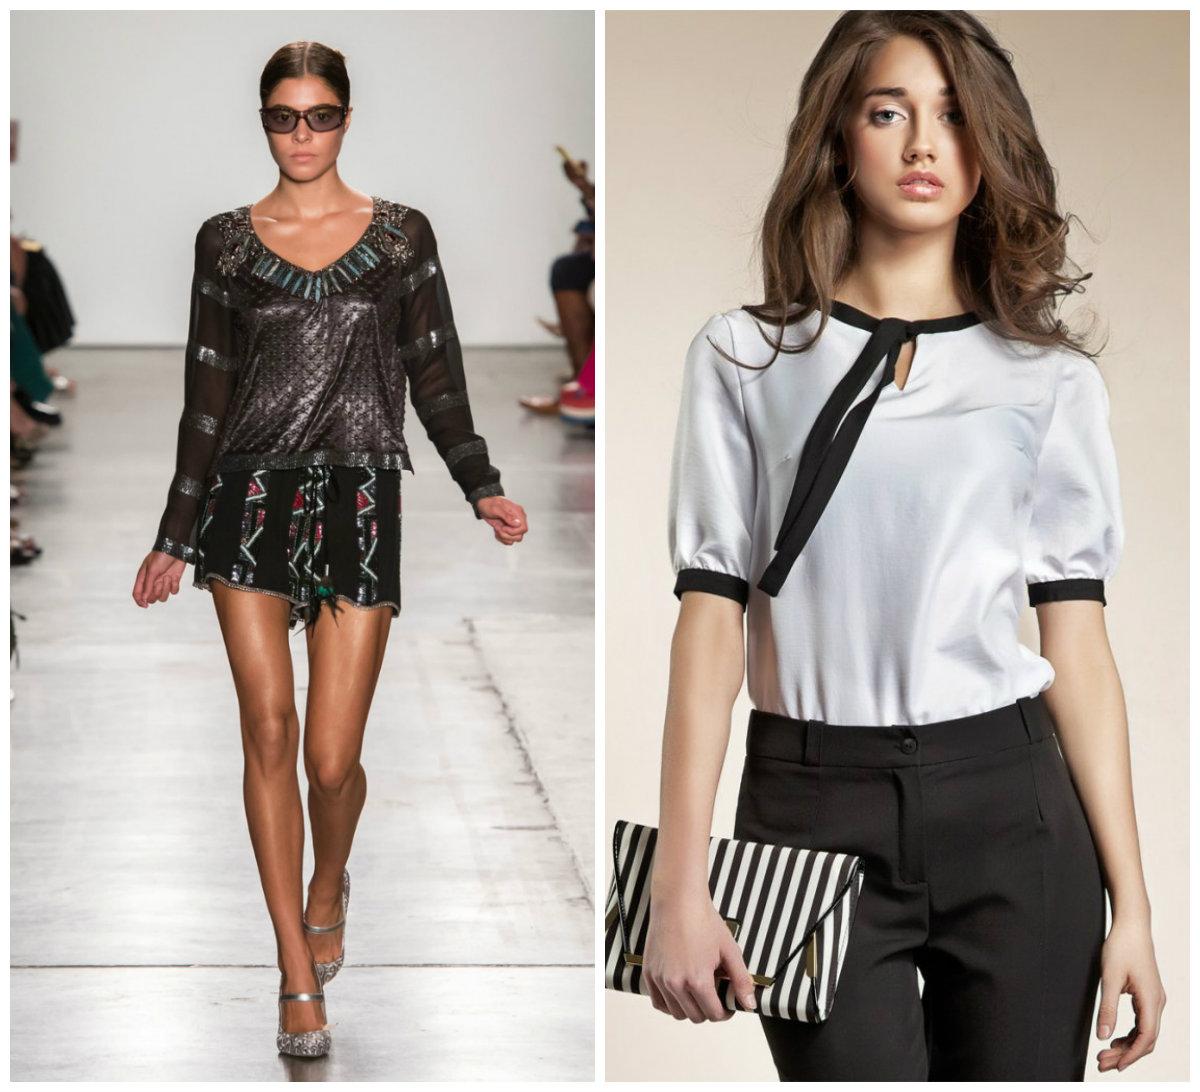 Женские-блузки-2018-романтика-Фото-атлас-и-вышивка-женские блузки 2018, фото